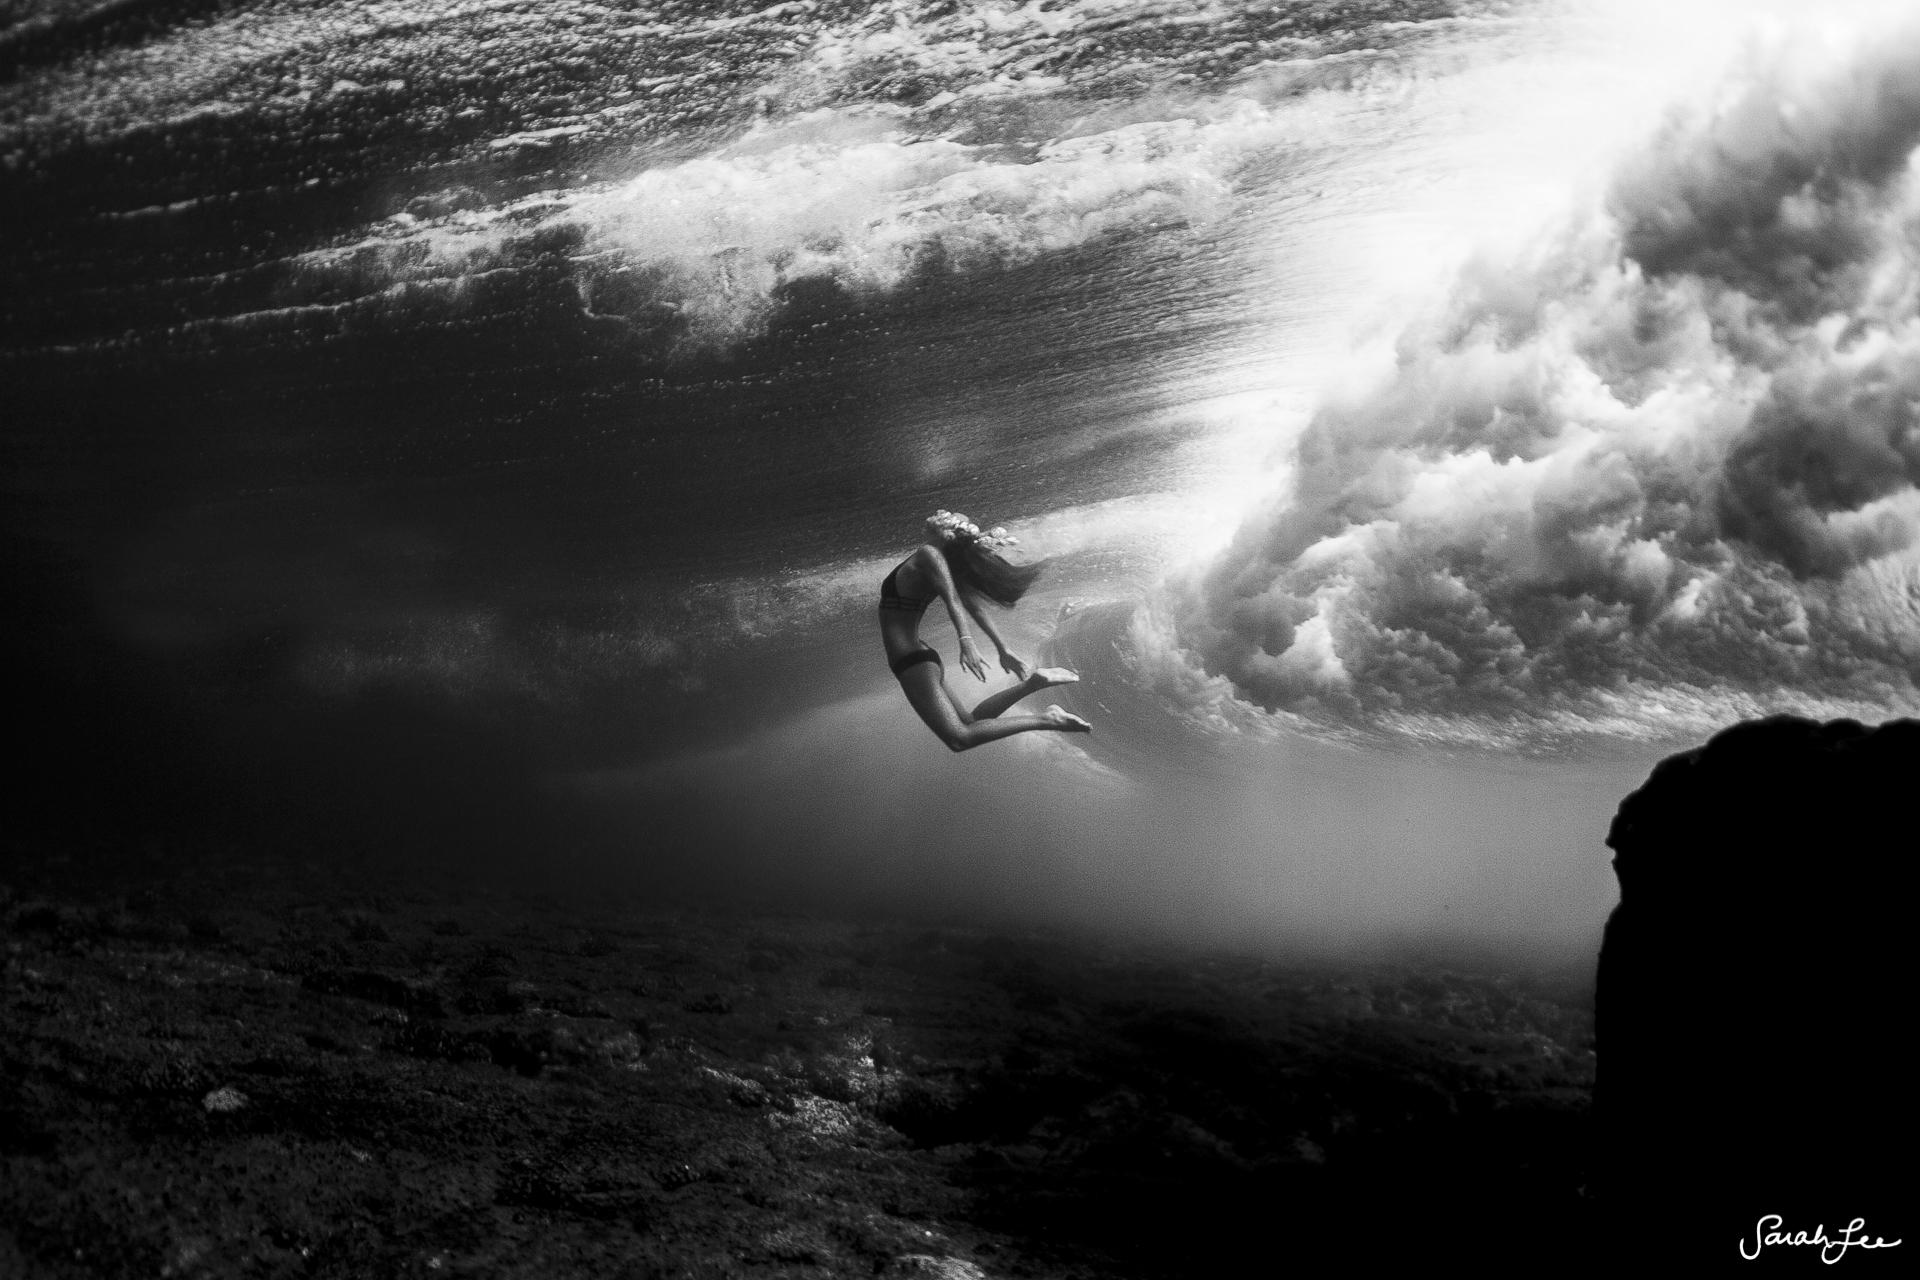 025_Sarah_Lee_Photography_Underwater_7817.jpg